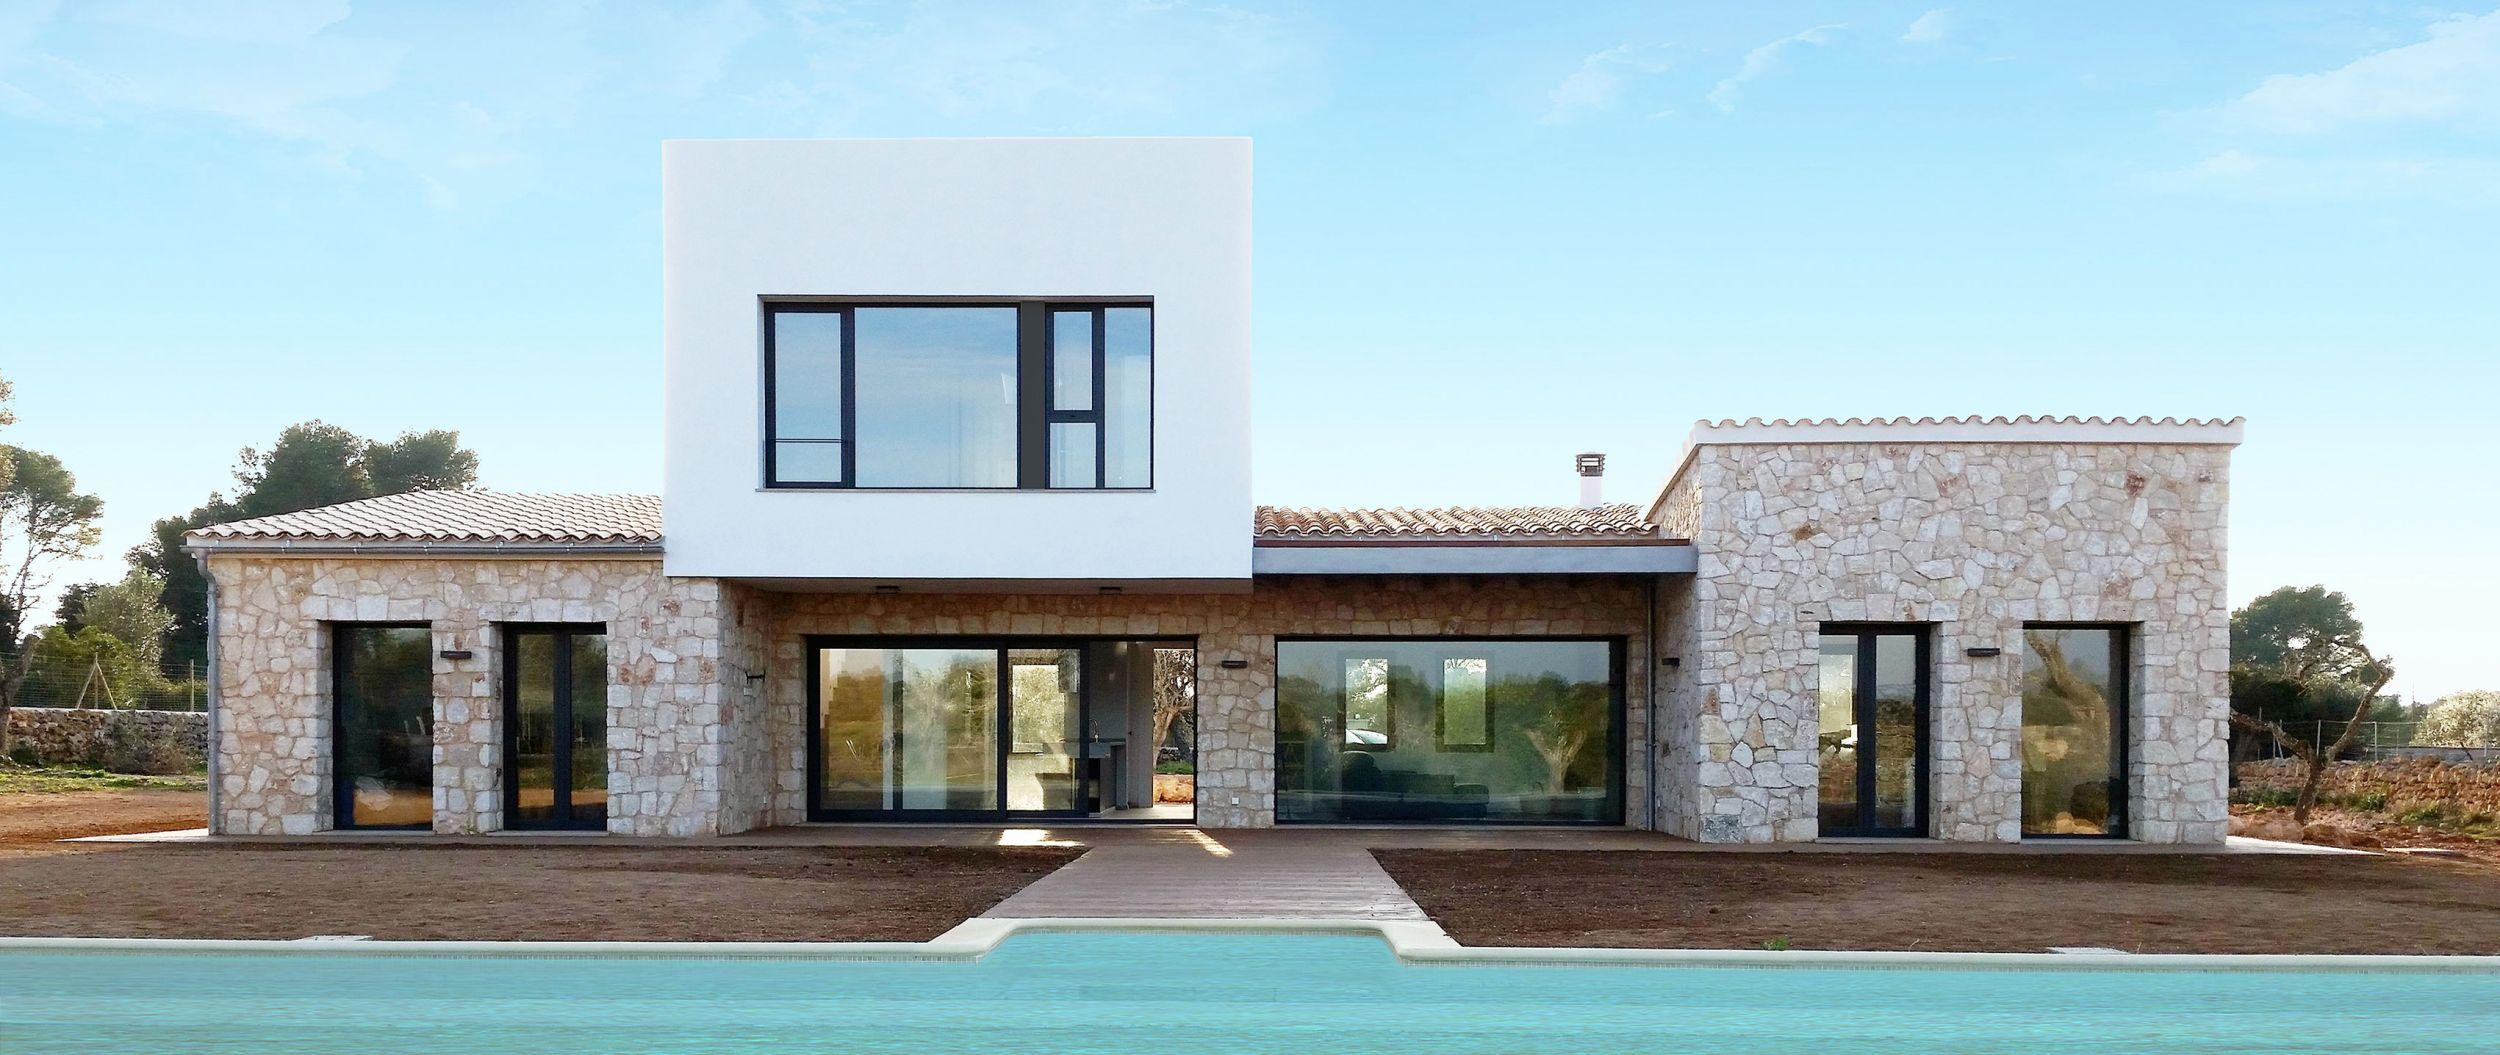 Jaime salv arquitectura interiorismo j273 casa rub n for Reformas de fachadas en palma